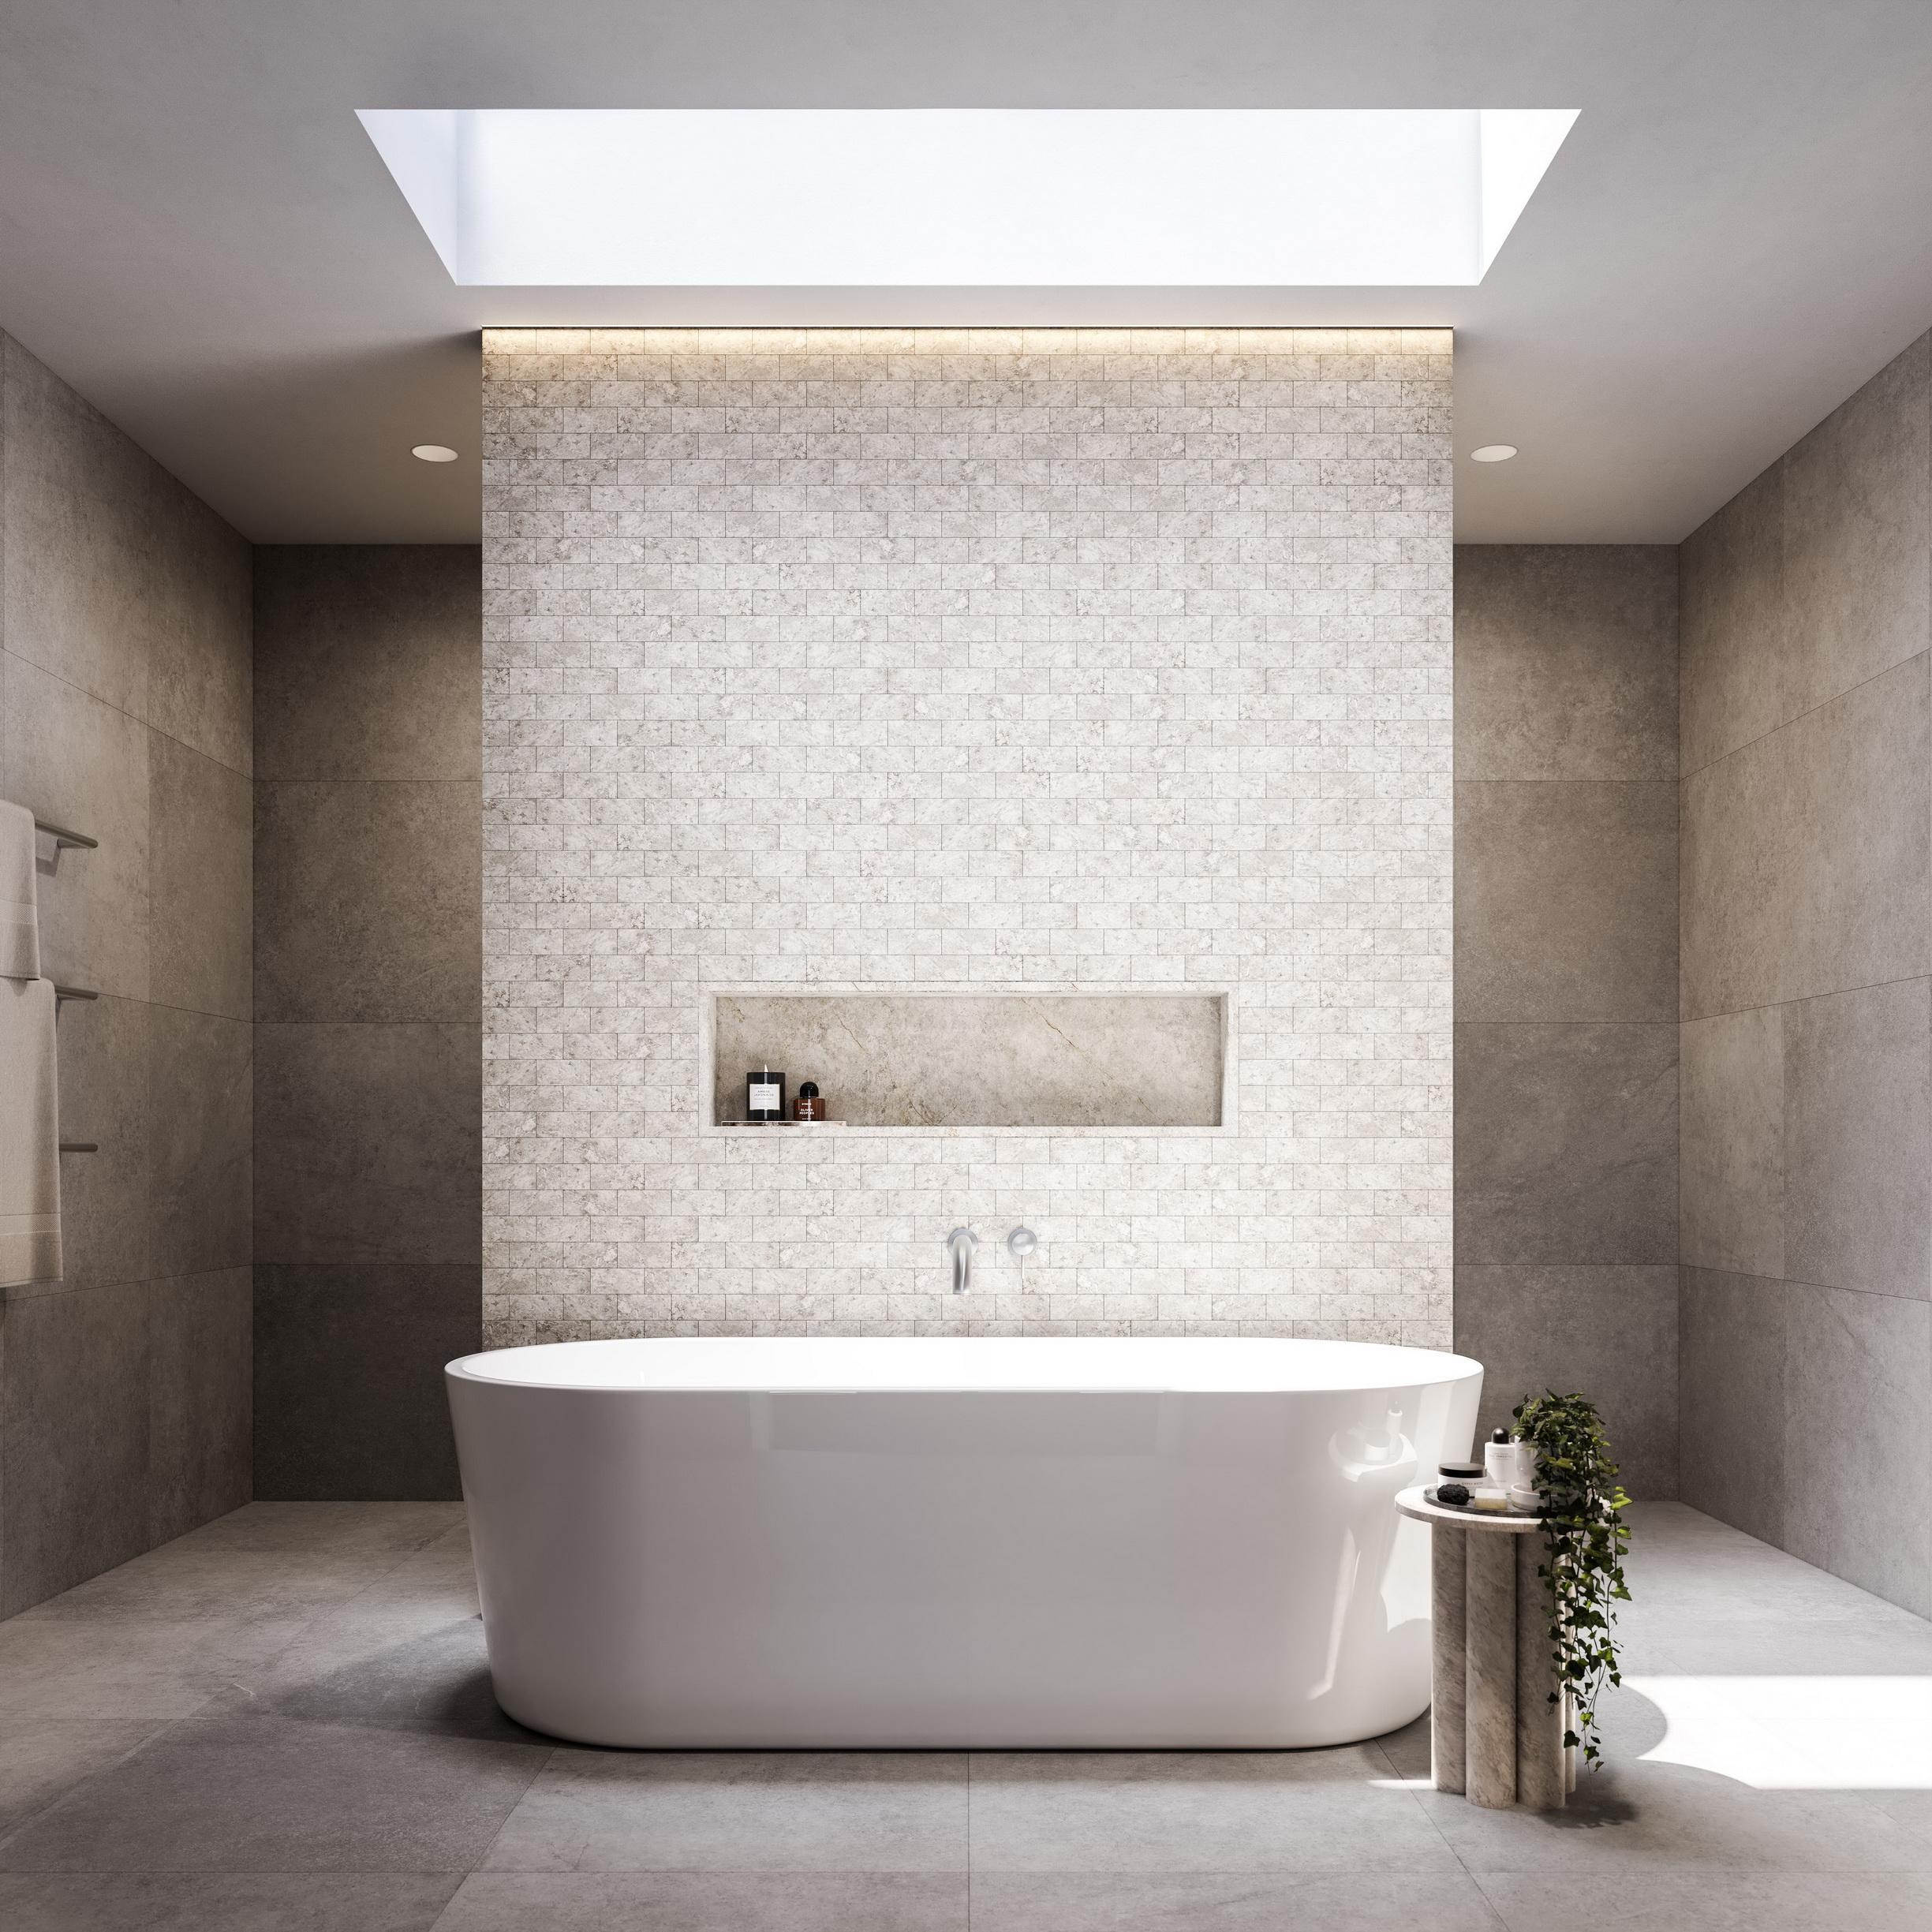 fkd-studio-3d-archiecture-visualisation-cgi-archviz-eaglemont-interior-fireplace-bathroom